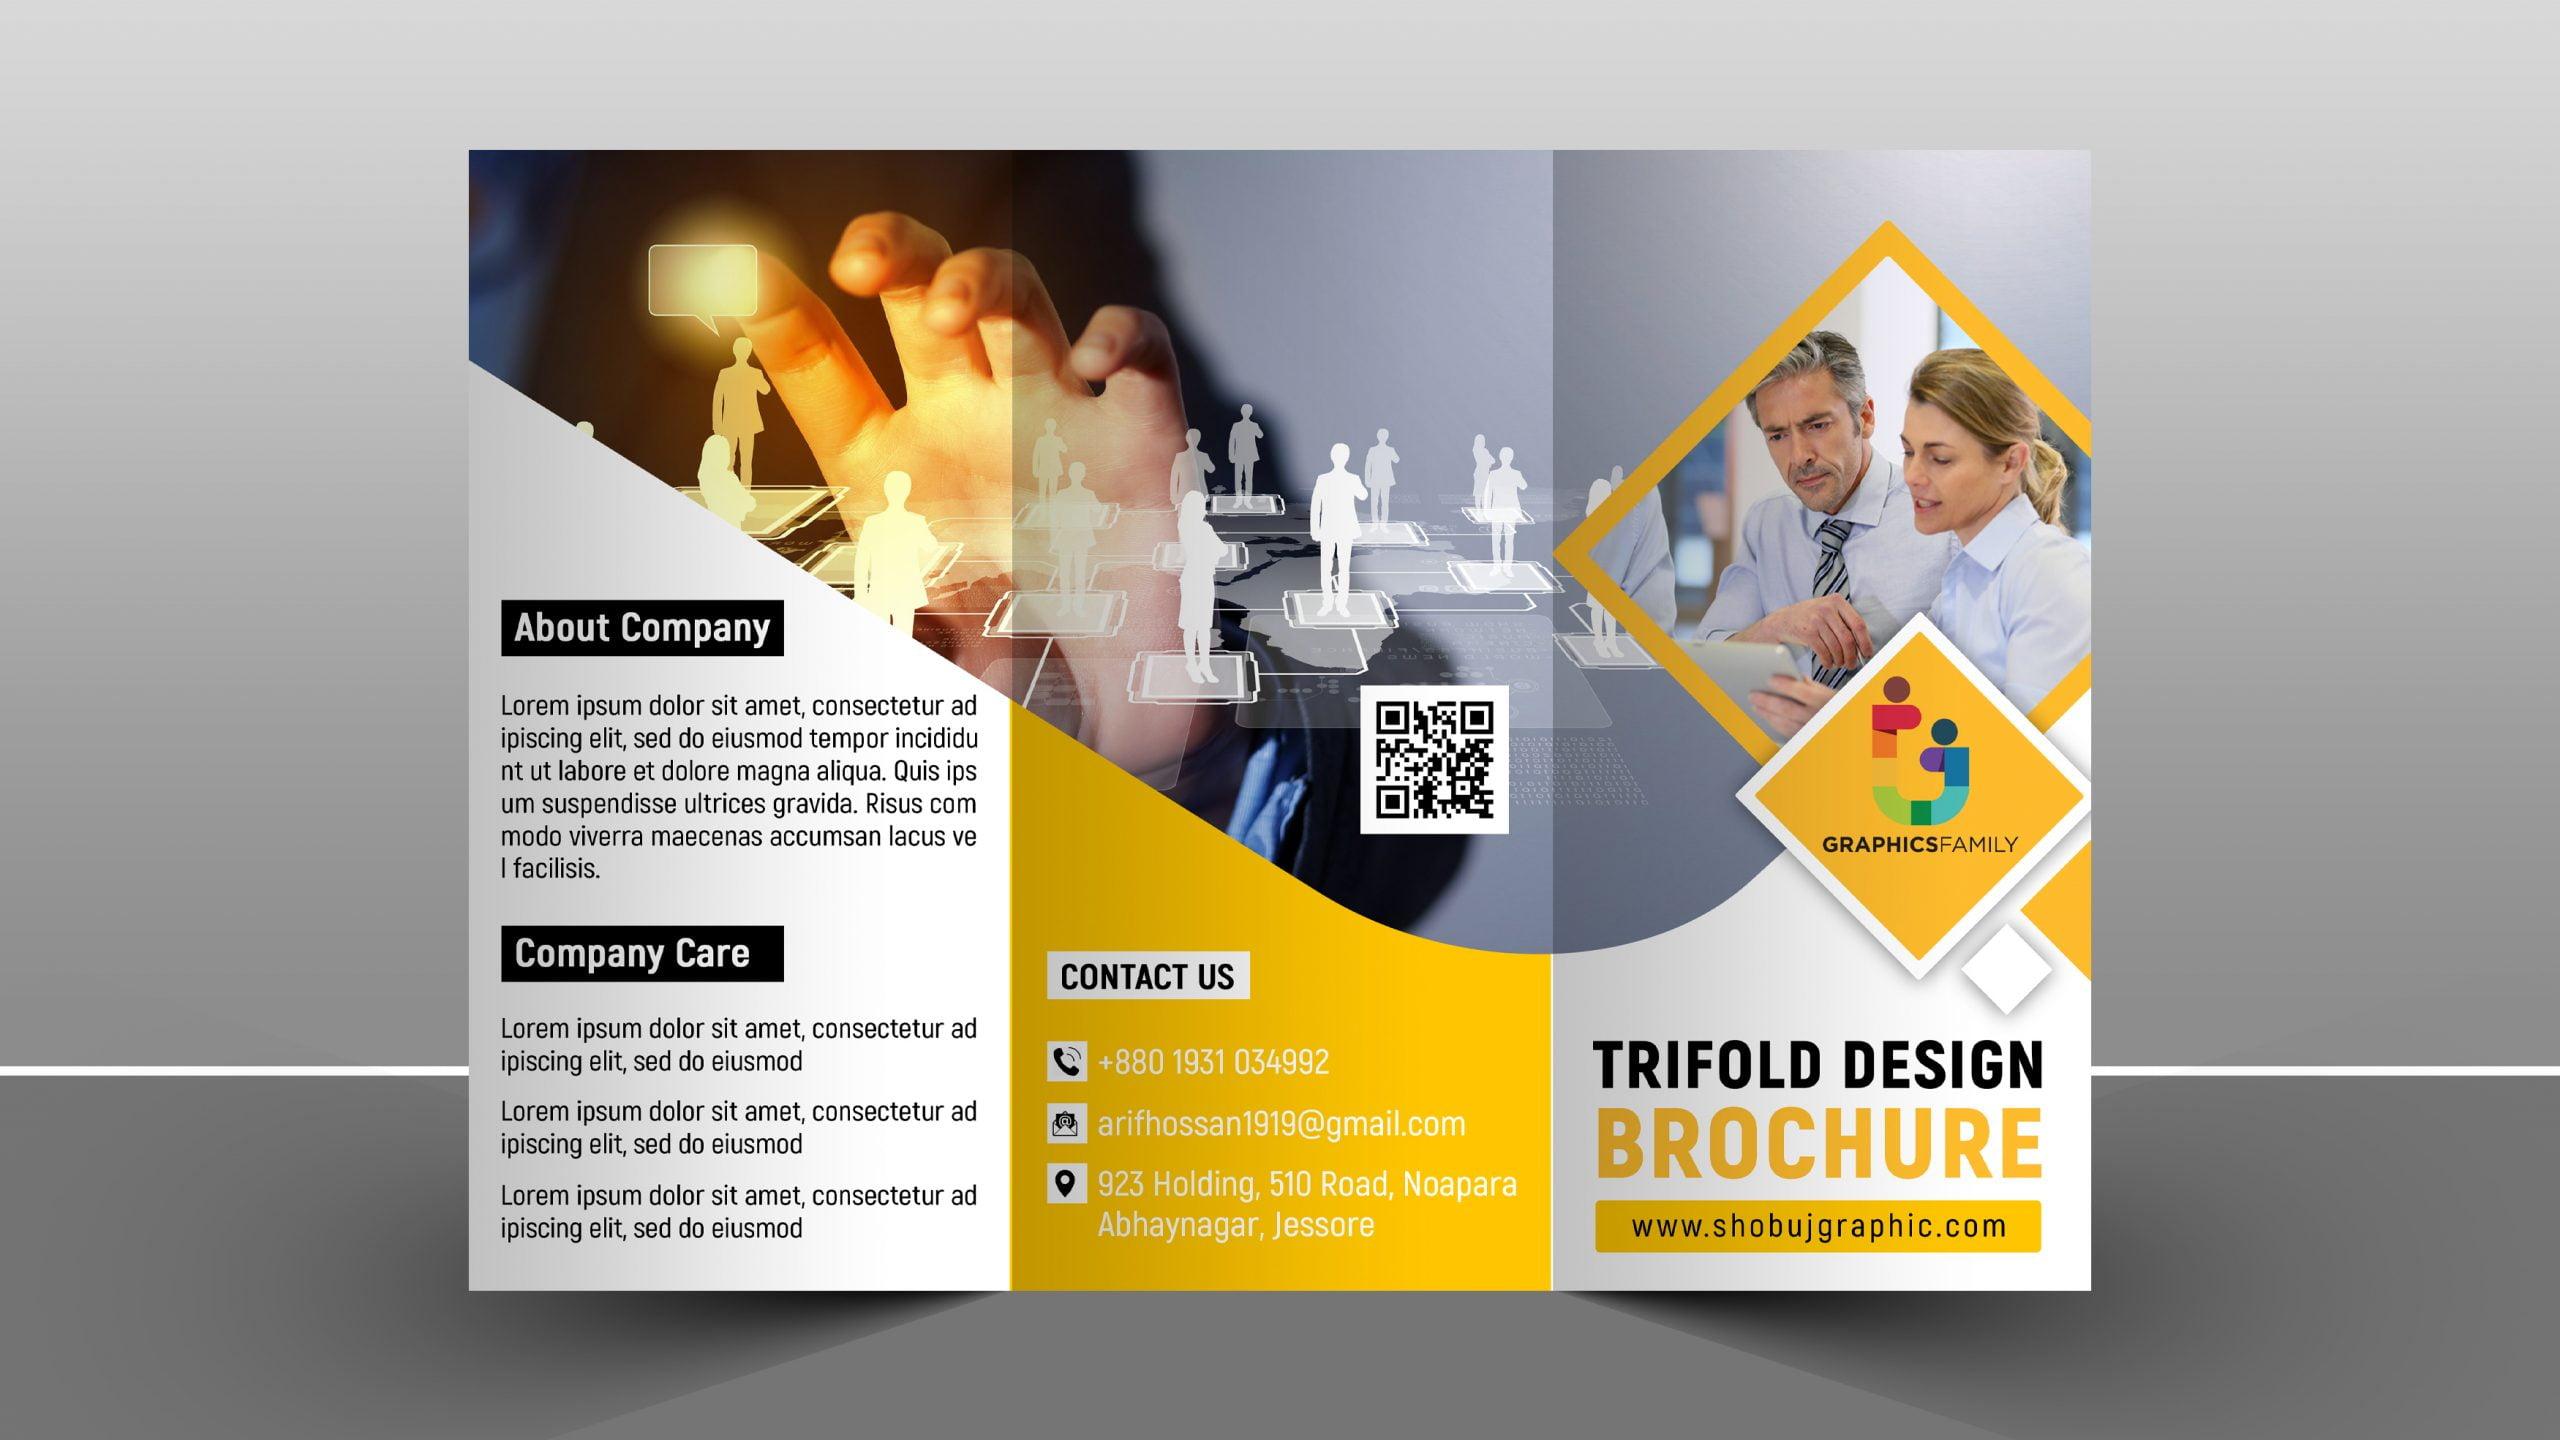 Corporate trifold brochure template design